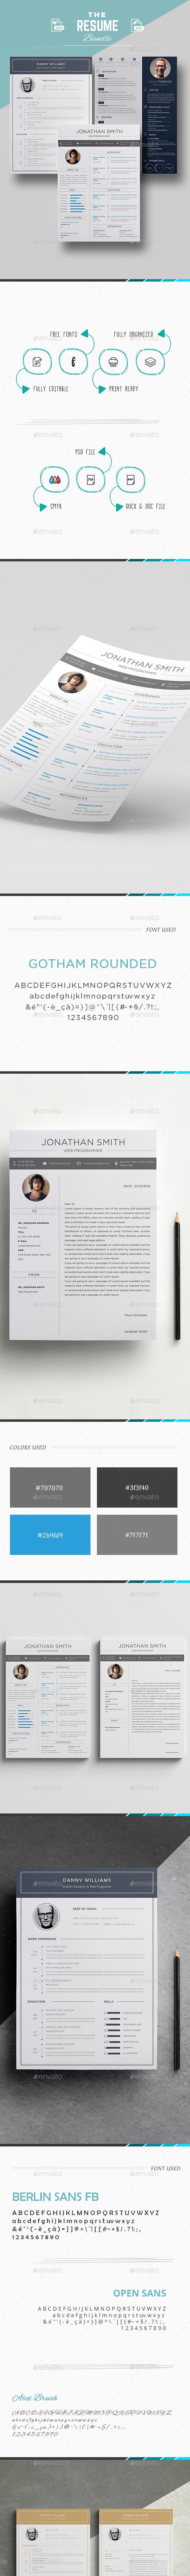 3 Resume/CV Bundle - Resumes Stationery